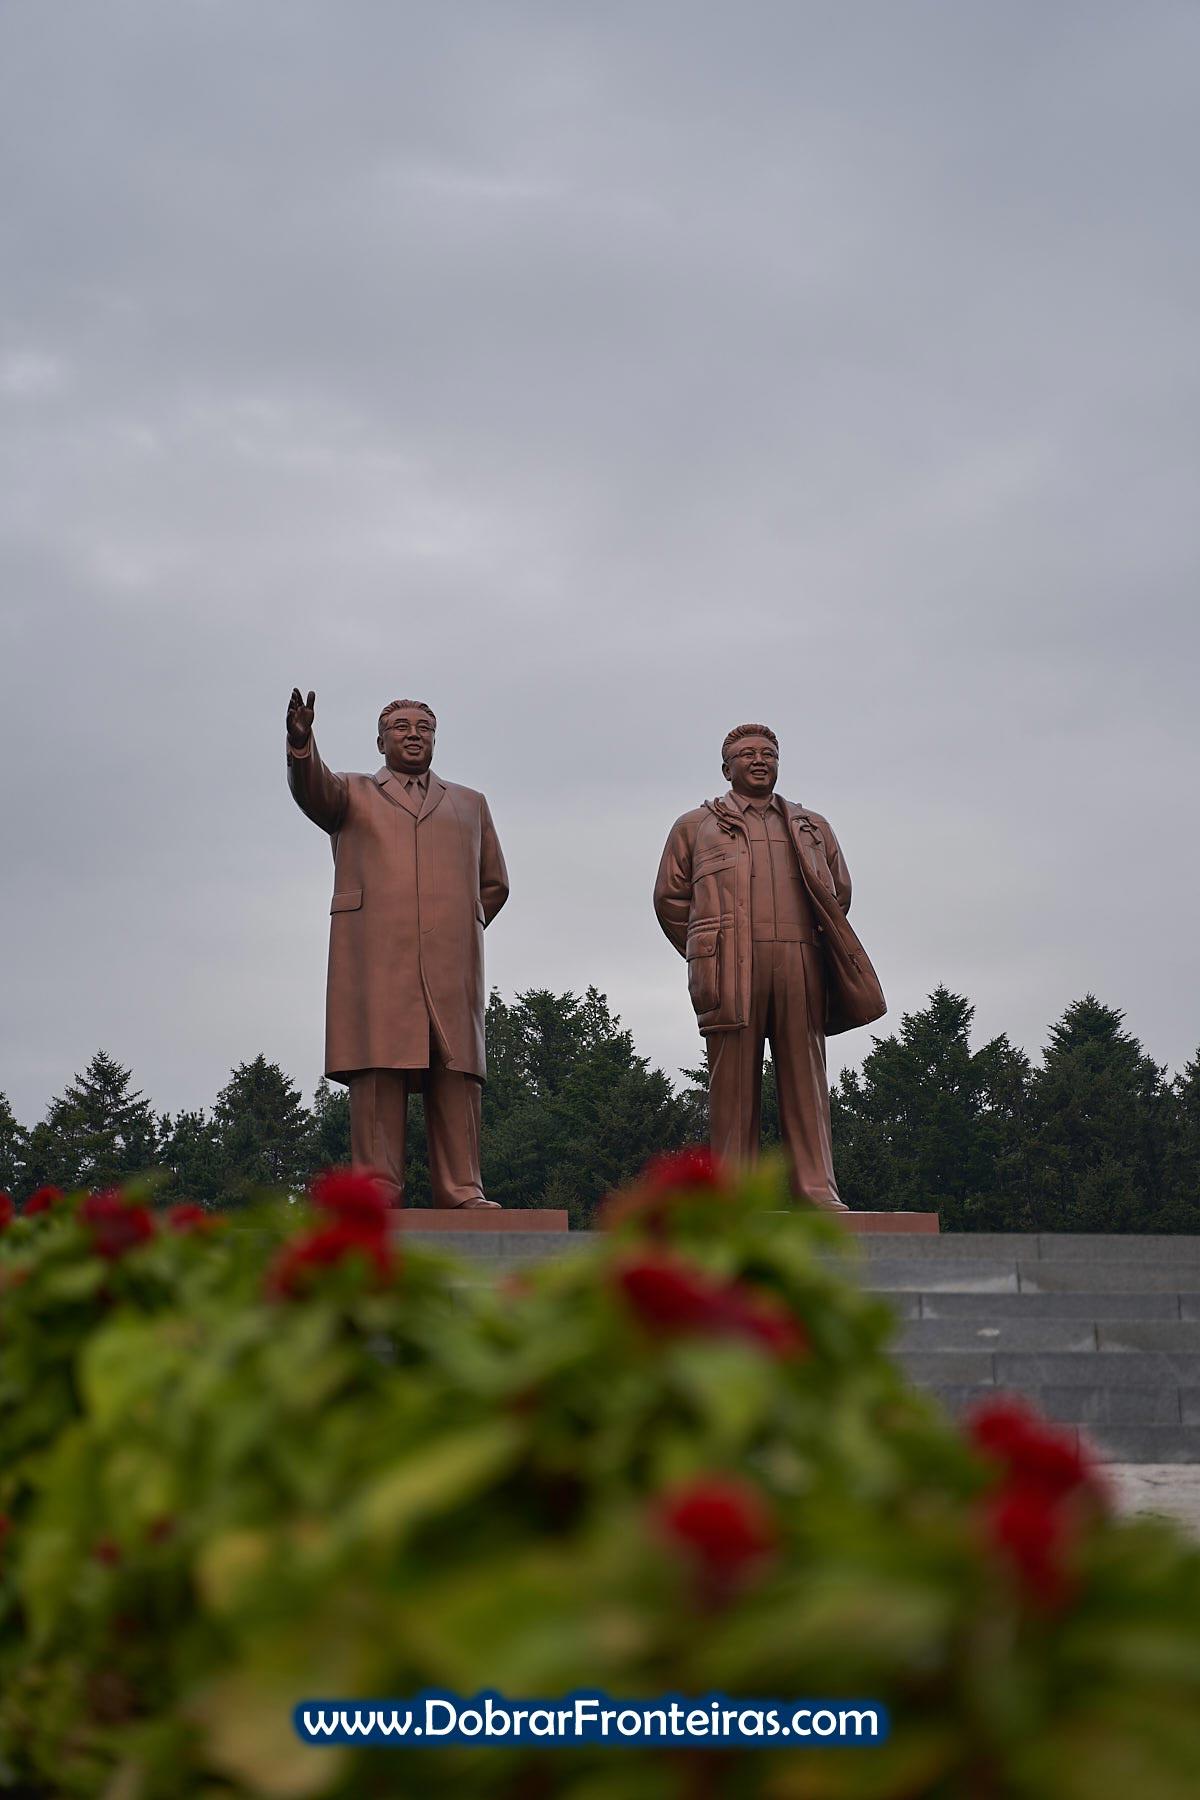 Estátuas dos grandes líderes Kim-Il-Sung e Kim Jung-Il na cidade de Hamhung, Coreia do Norte